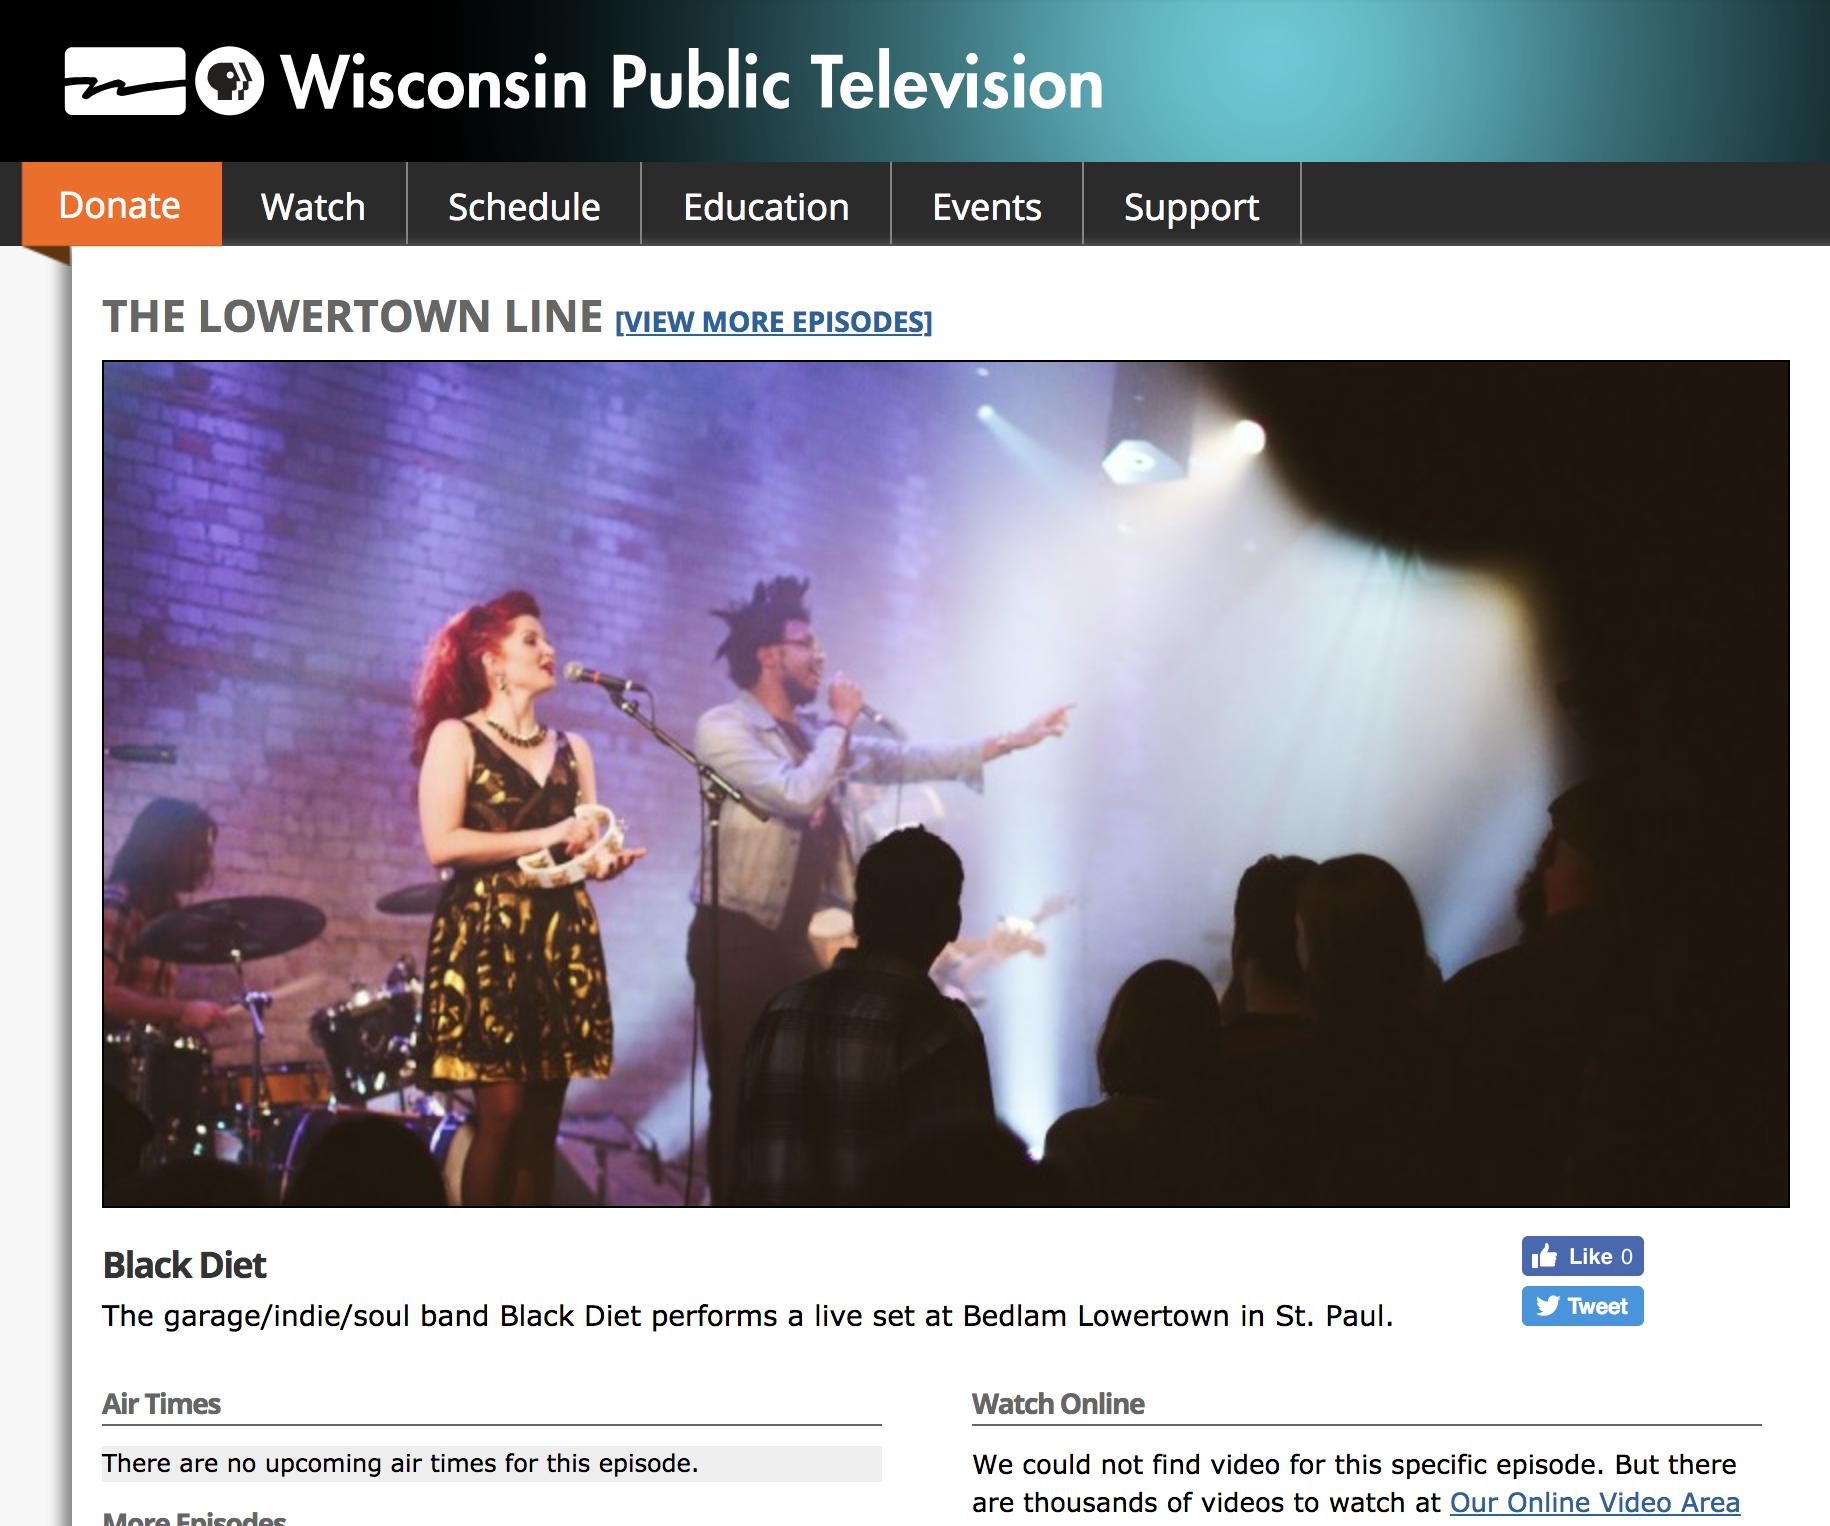 Wisconsin Public Television